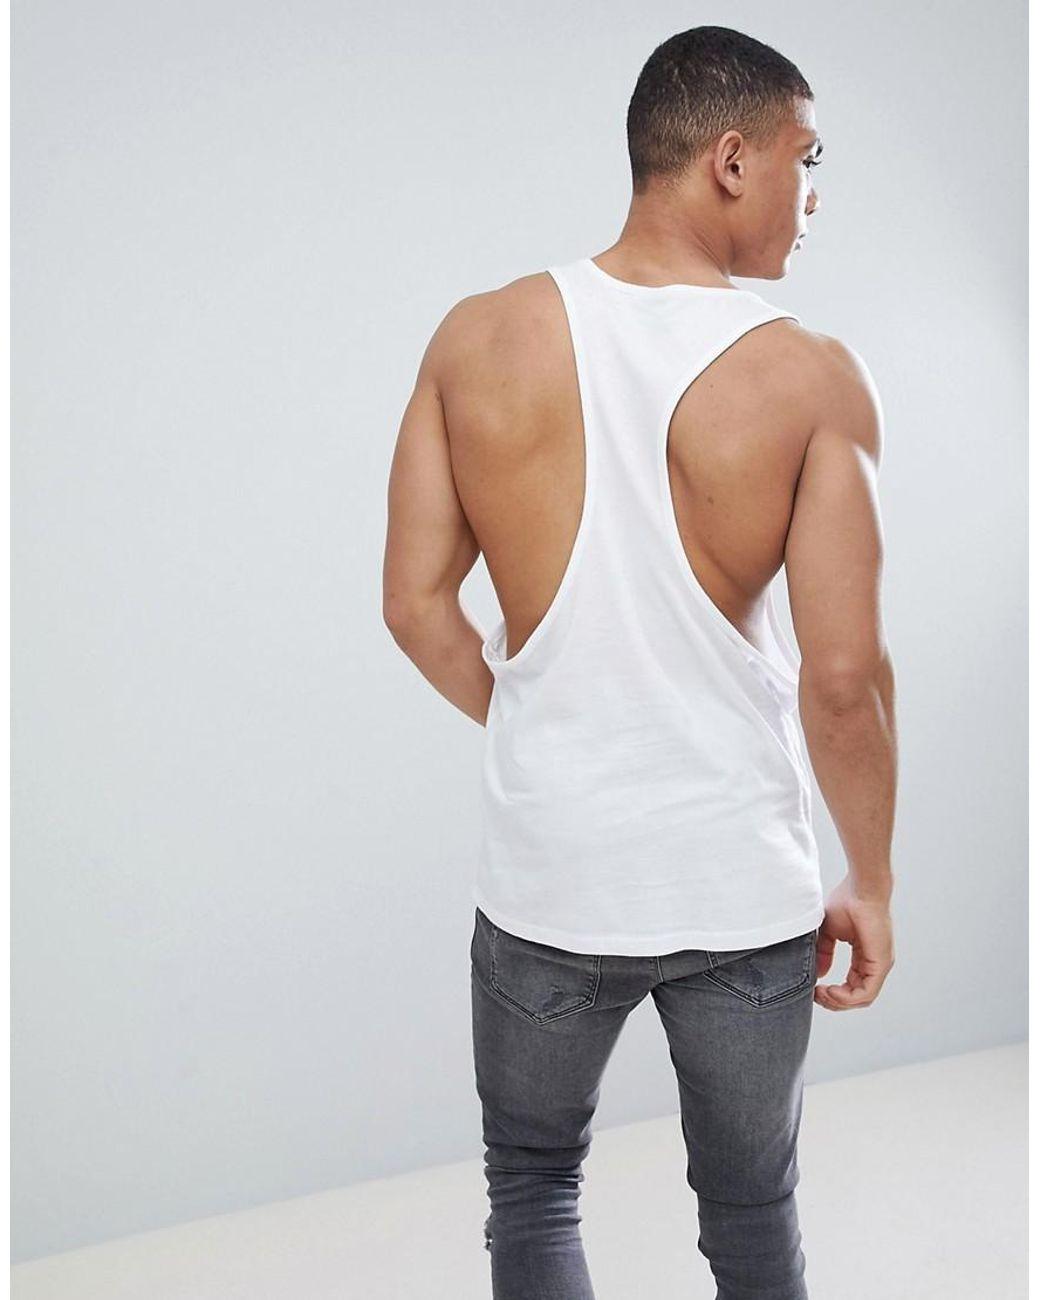 Camiseta negra sin mangas anudada en la parte trasera